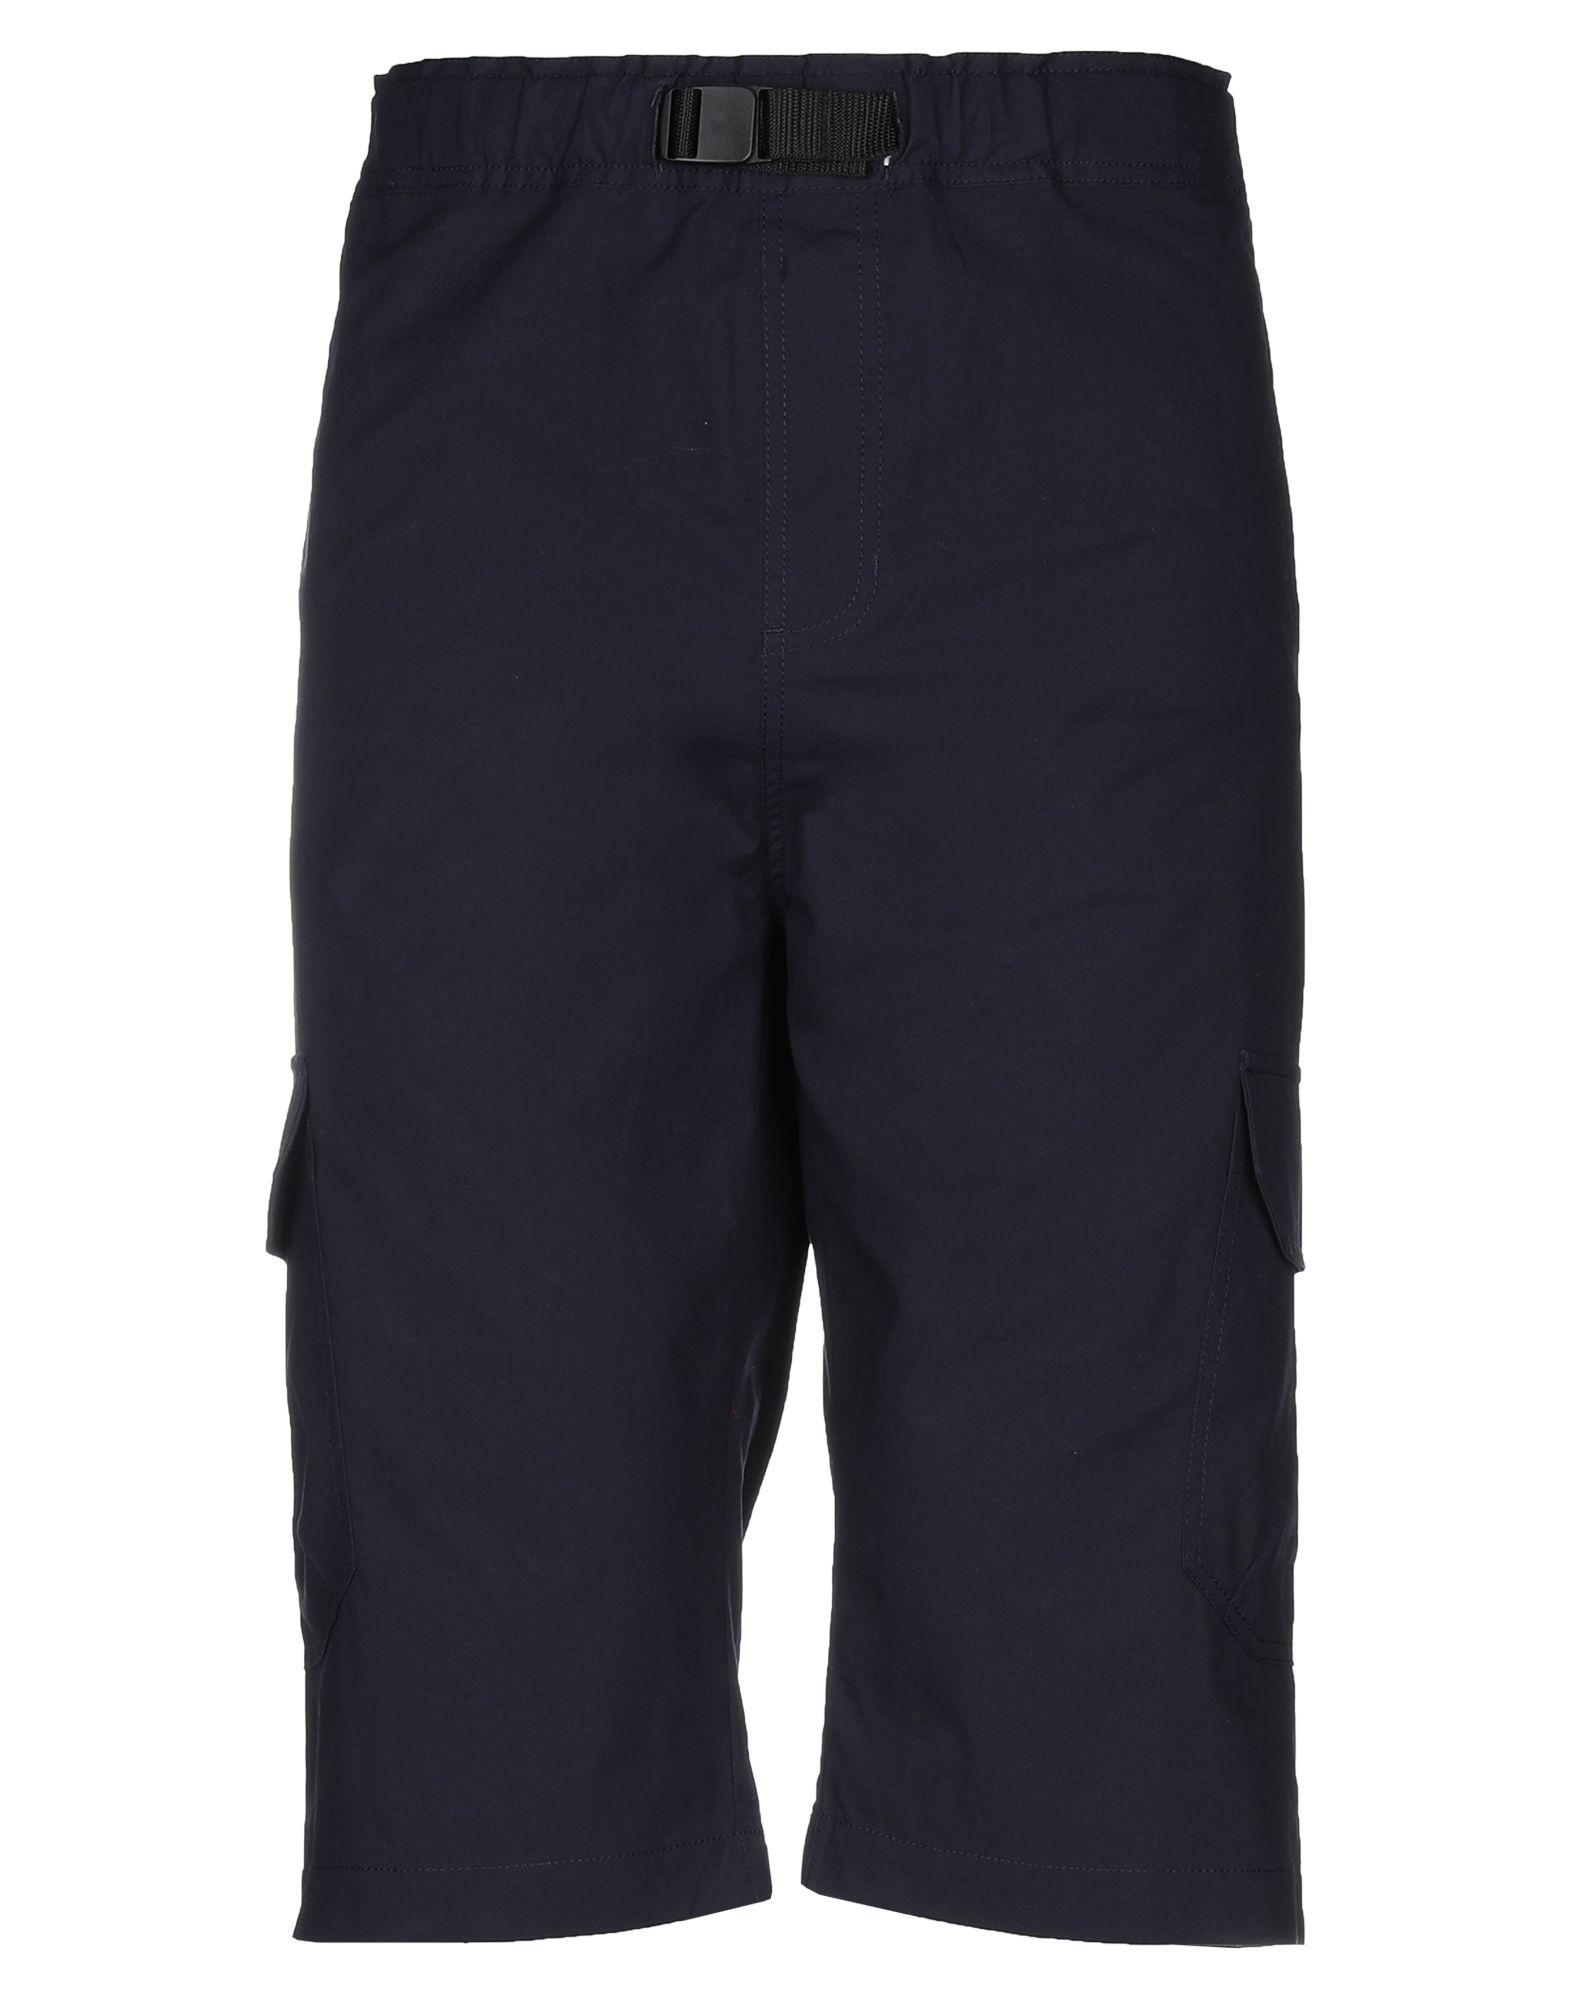 CALVIN KLEIN JEANS Бермуды джинсы мужские calvin klein jeans цвет синий j30j306711 9113 размер 30 32 44 46 32